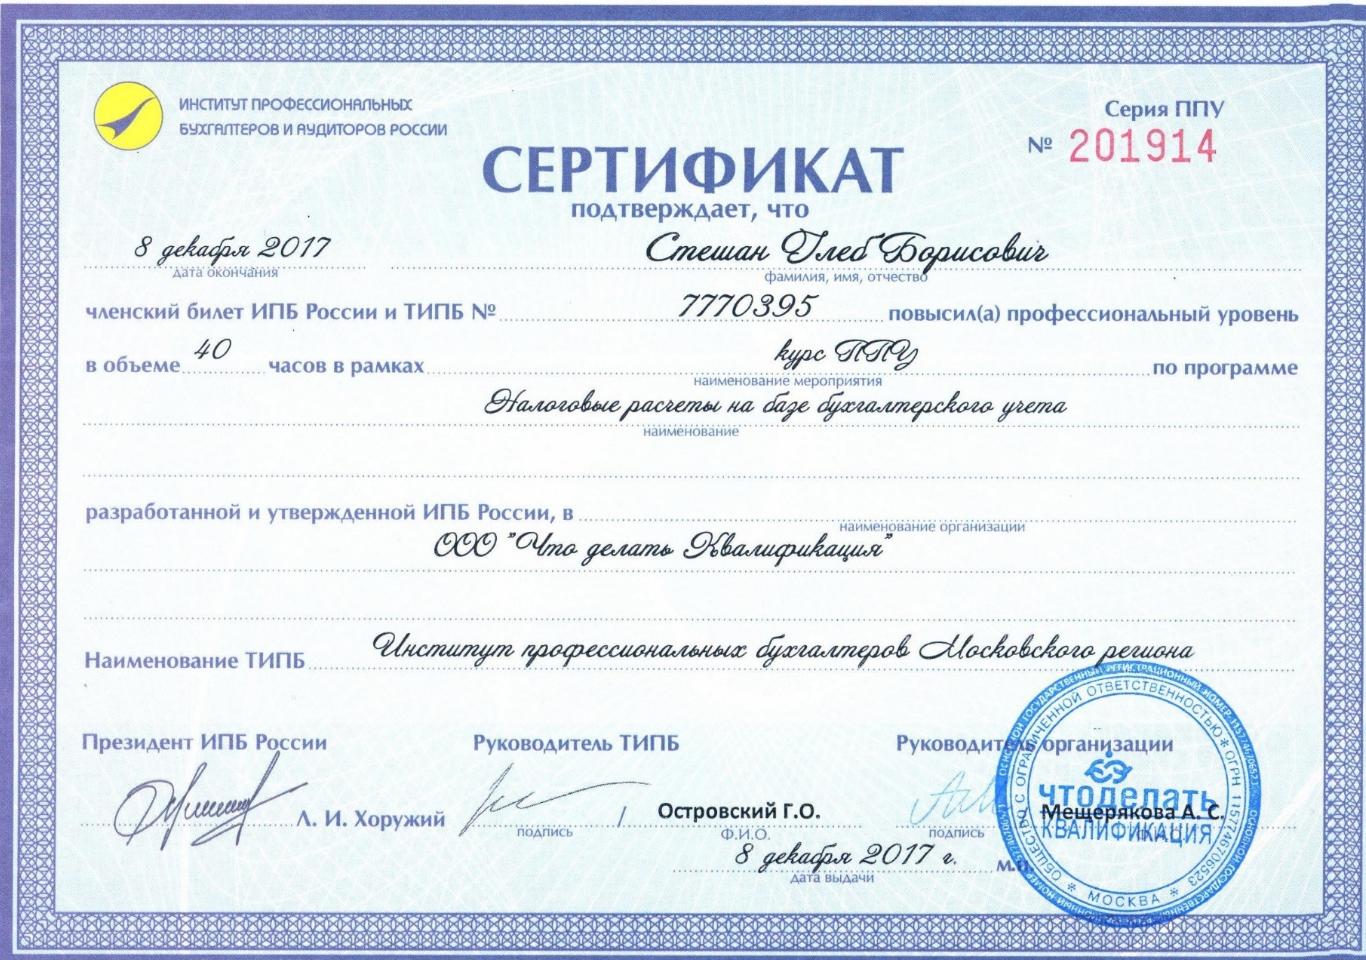 http://www.konsaltingpremium.ru/wp-content/uploads/2018/02/Sertifikat-40-chasov.jpg